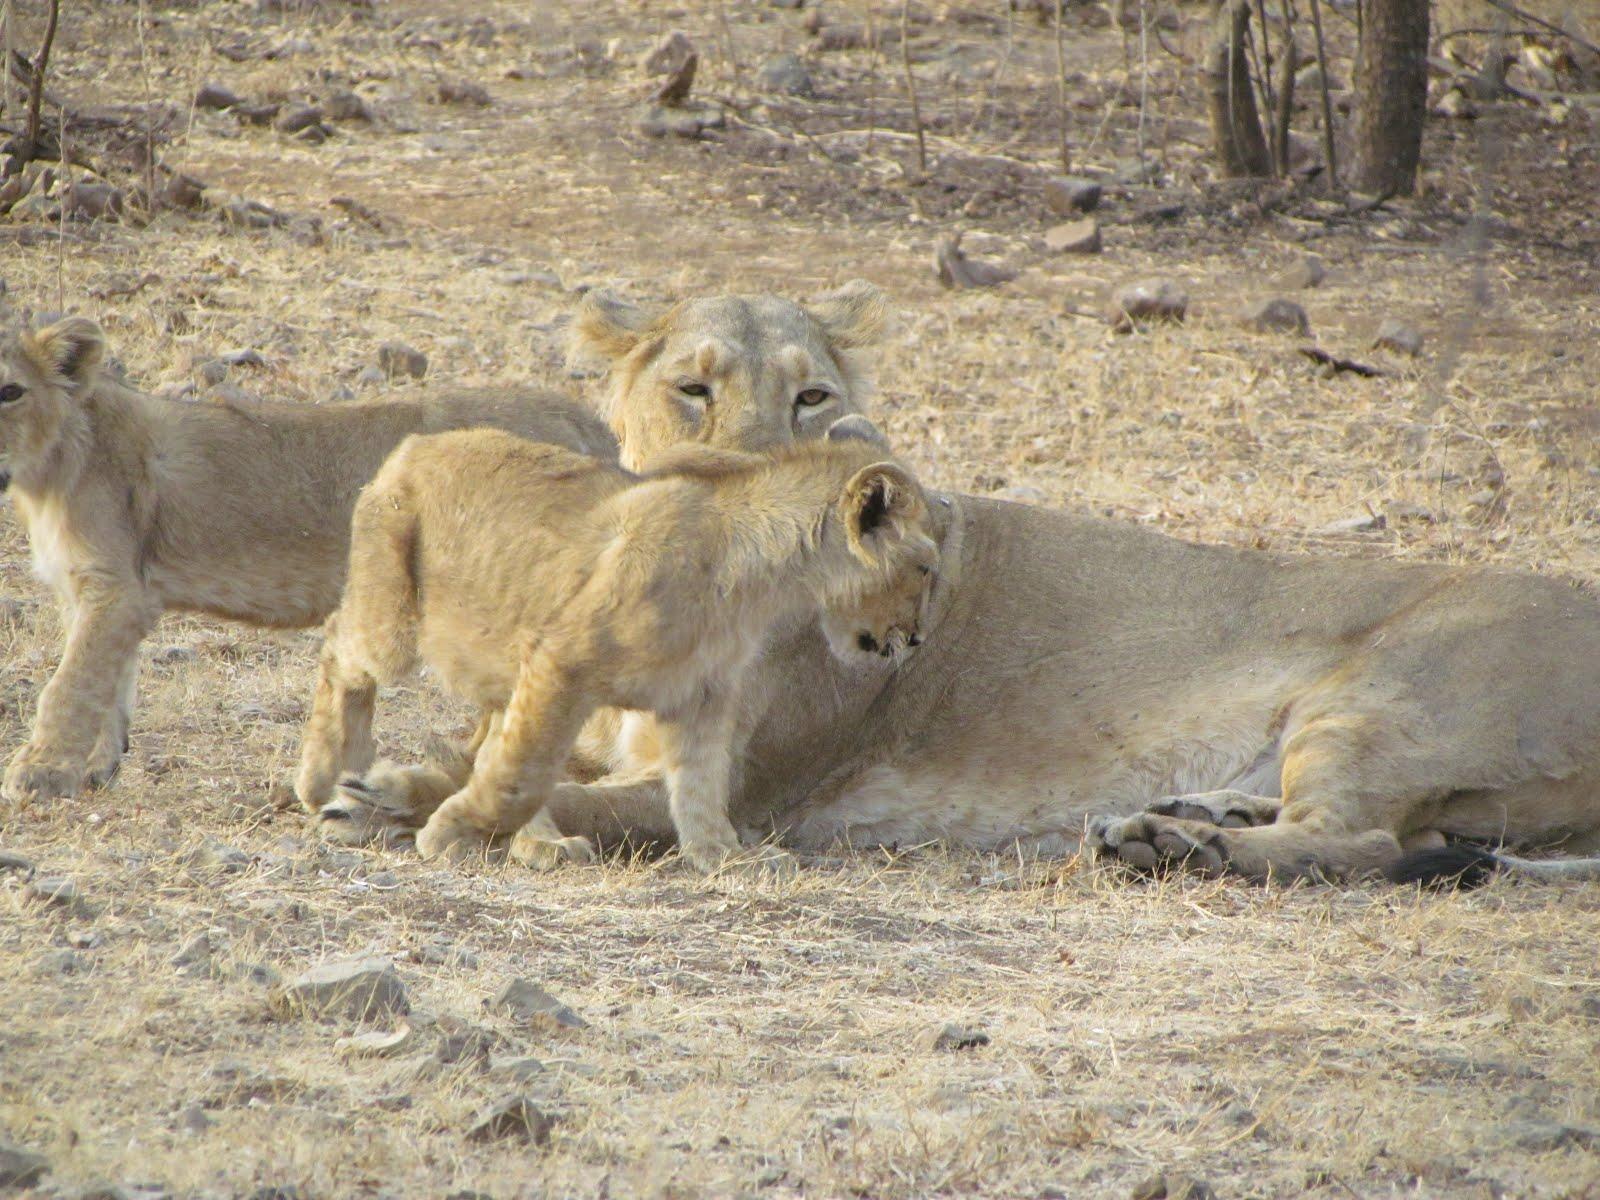 Asiatic Lion S At Gir National Park India Adler Tours